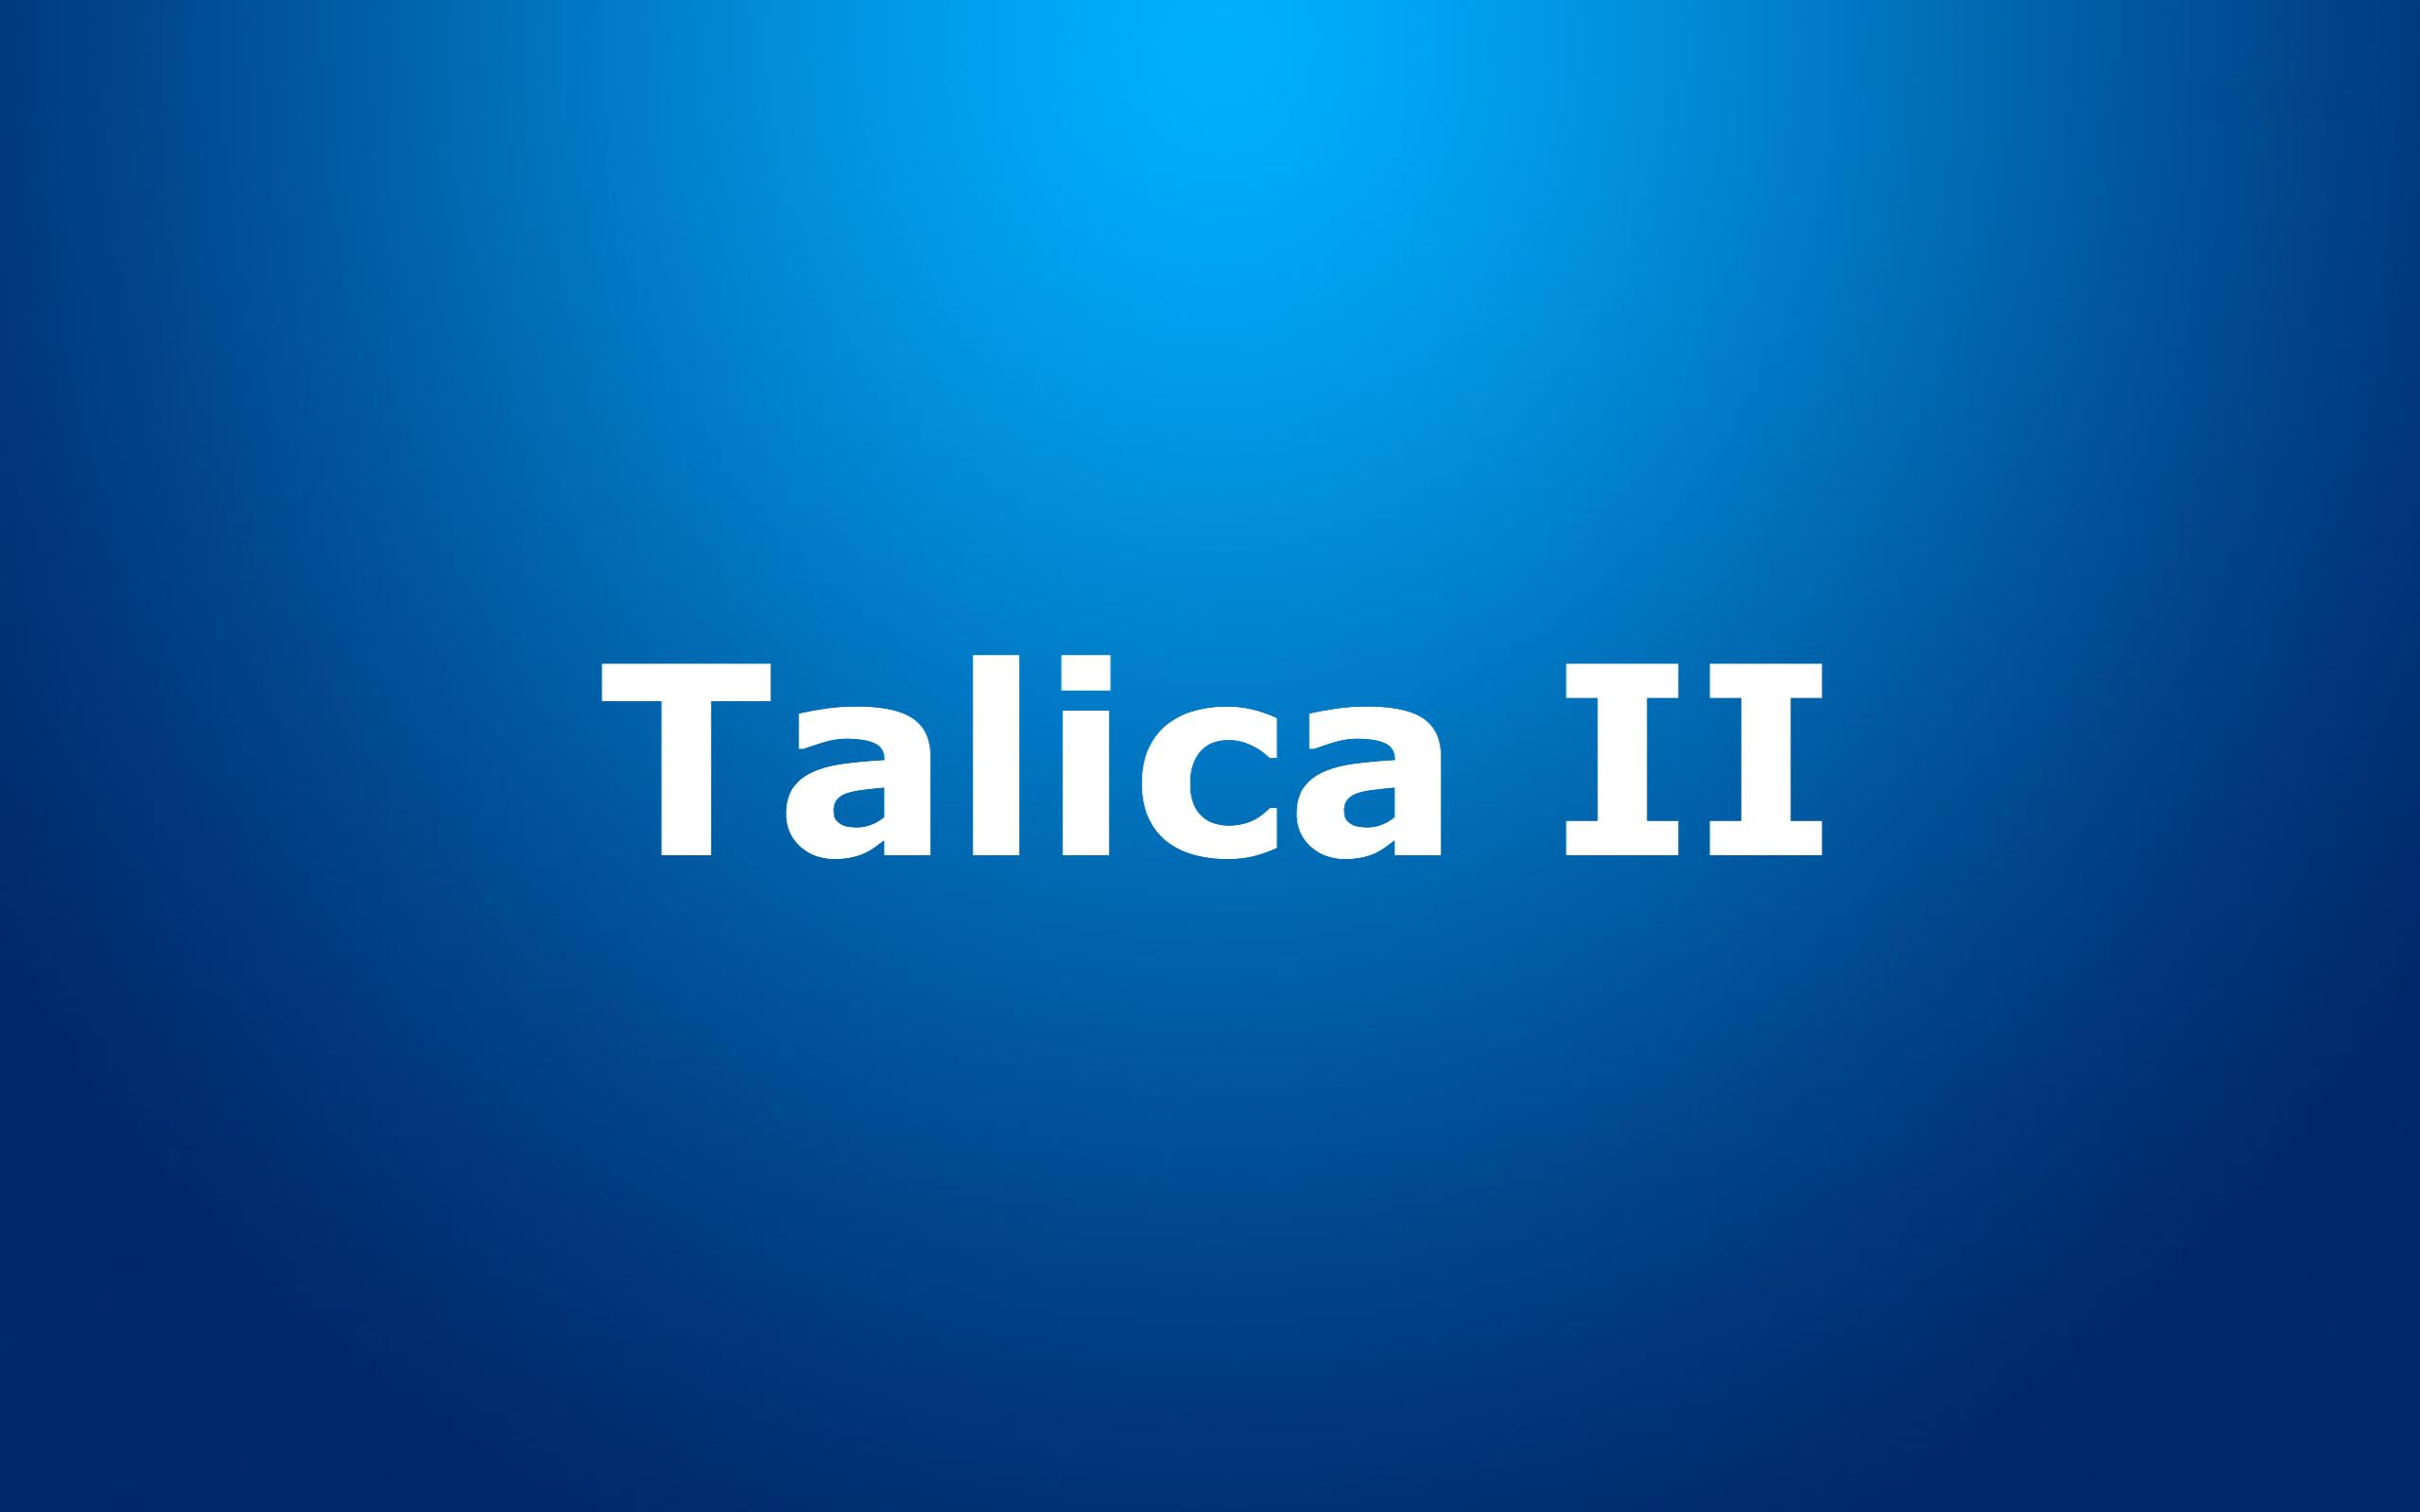 Talica II